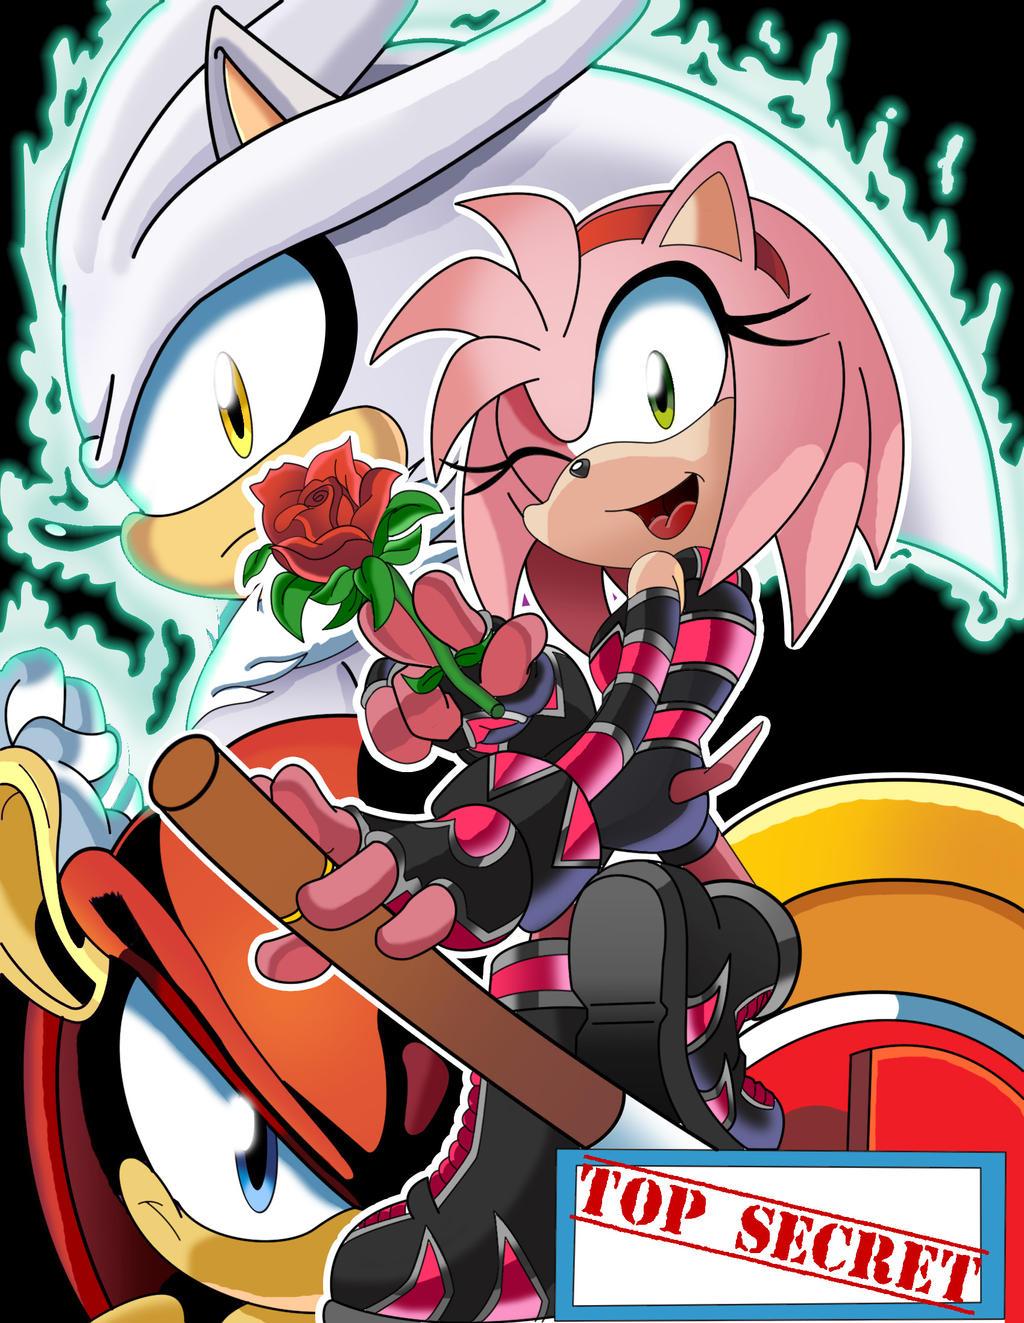 Sonic Universe Secret Rose fan cover (coloured) by leonarstist06